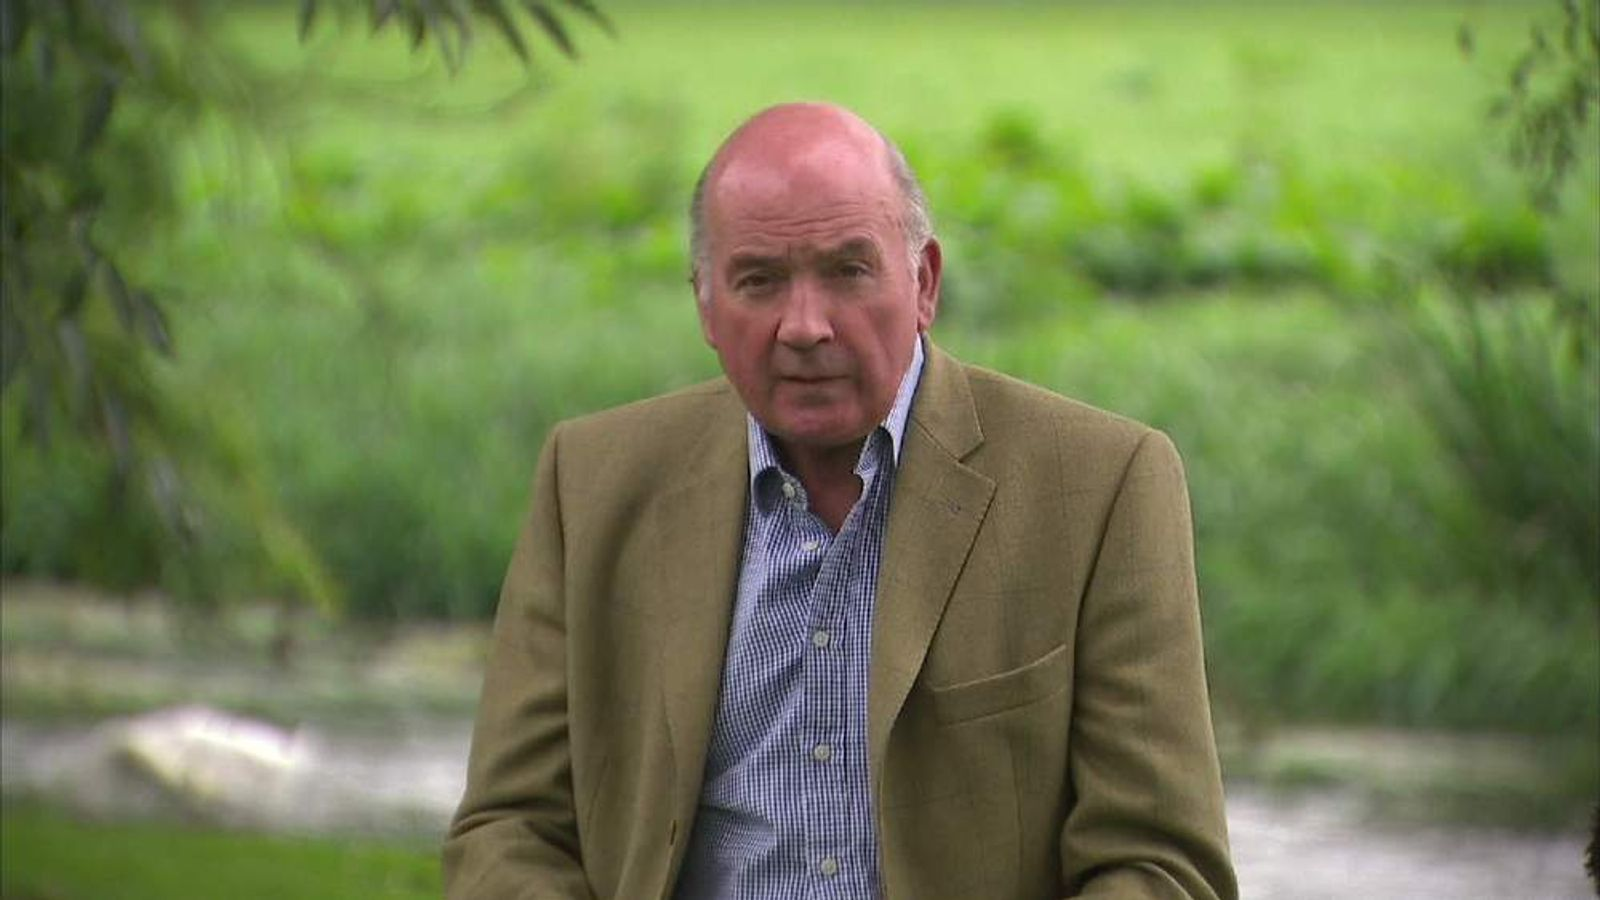 Former head of the Army Lord Dannatt